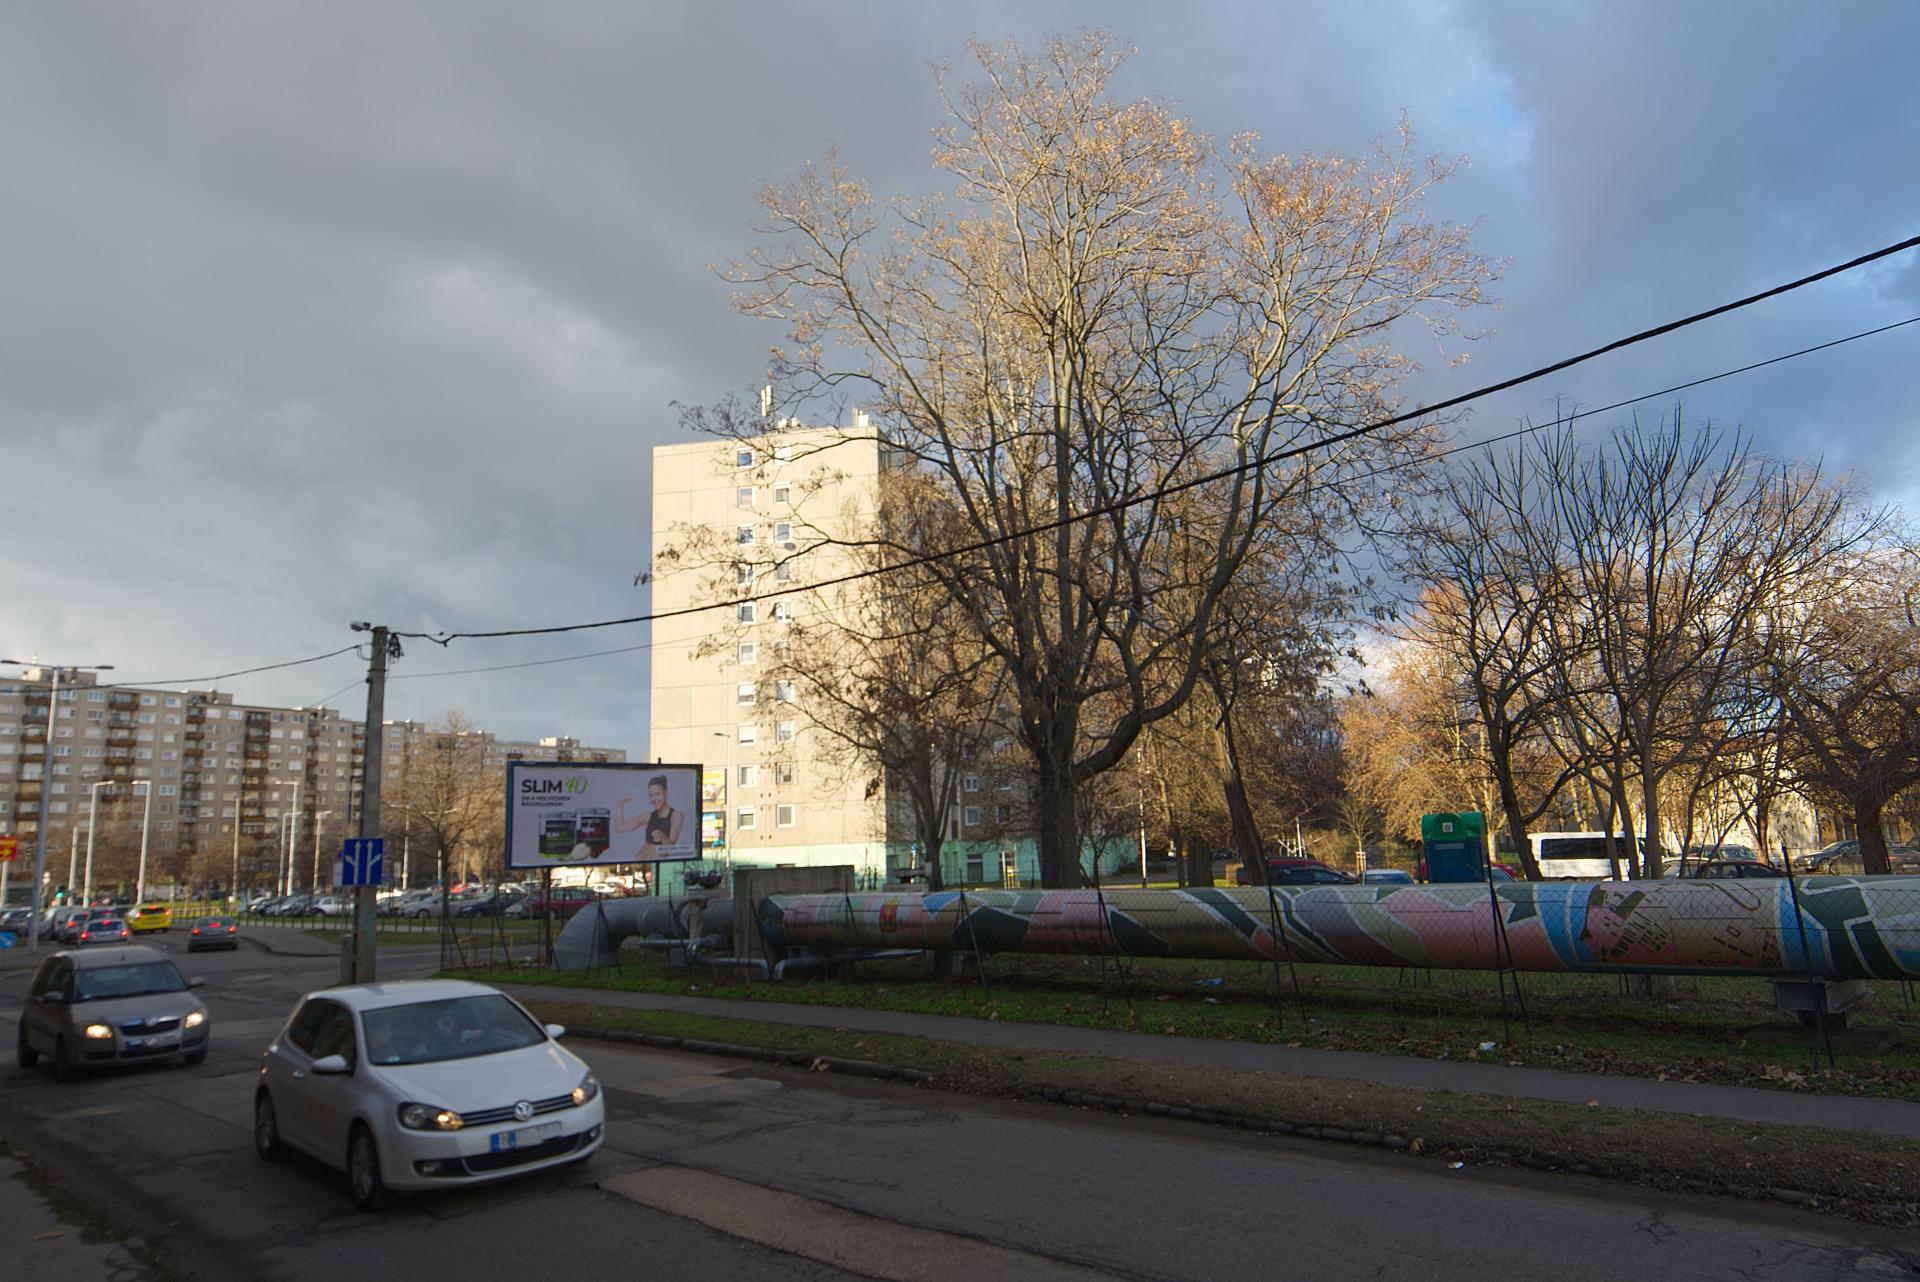 District 4, Tó utca 7.